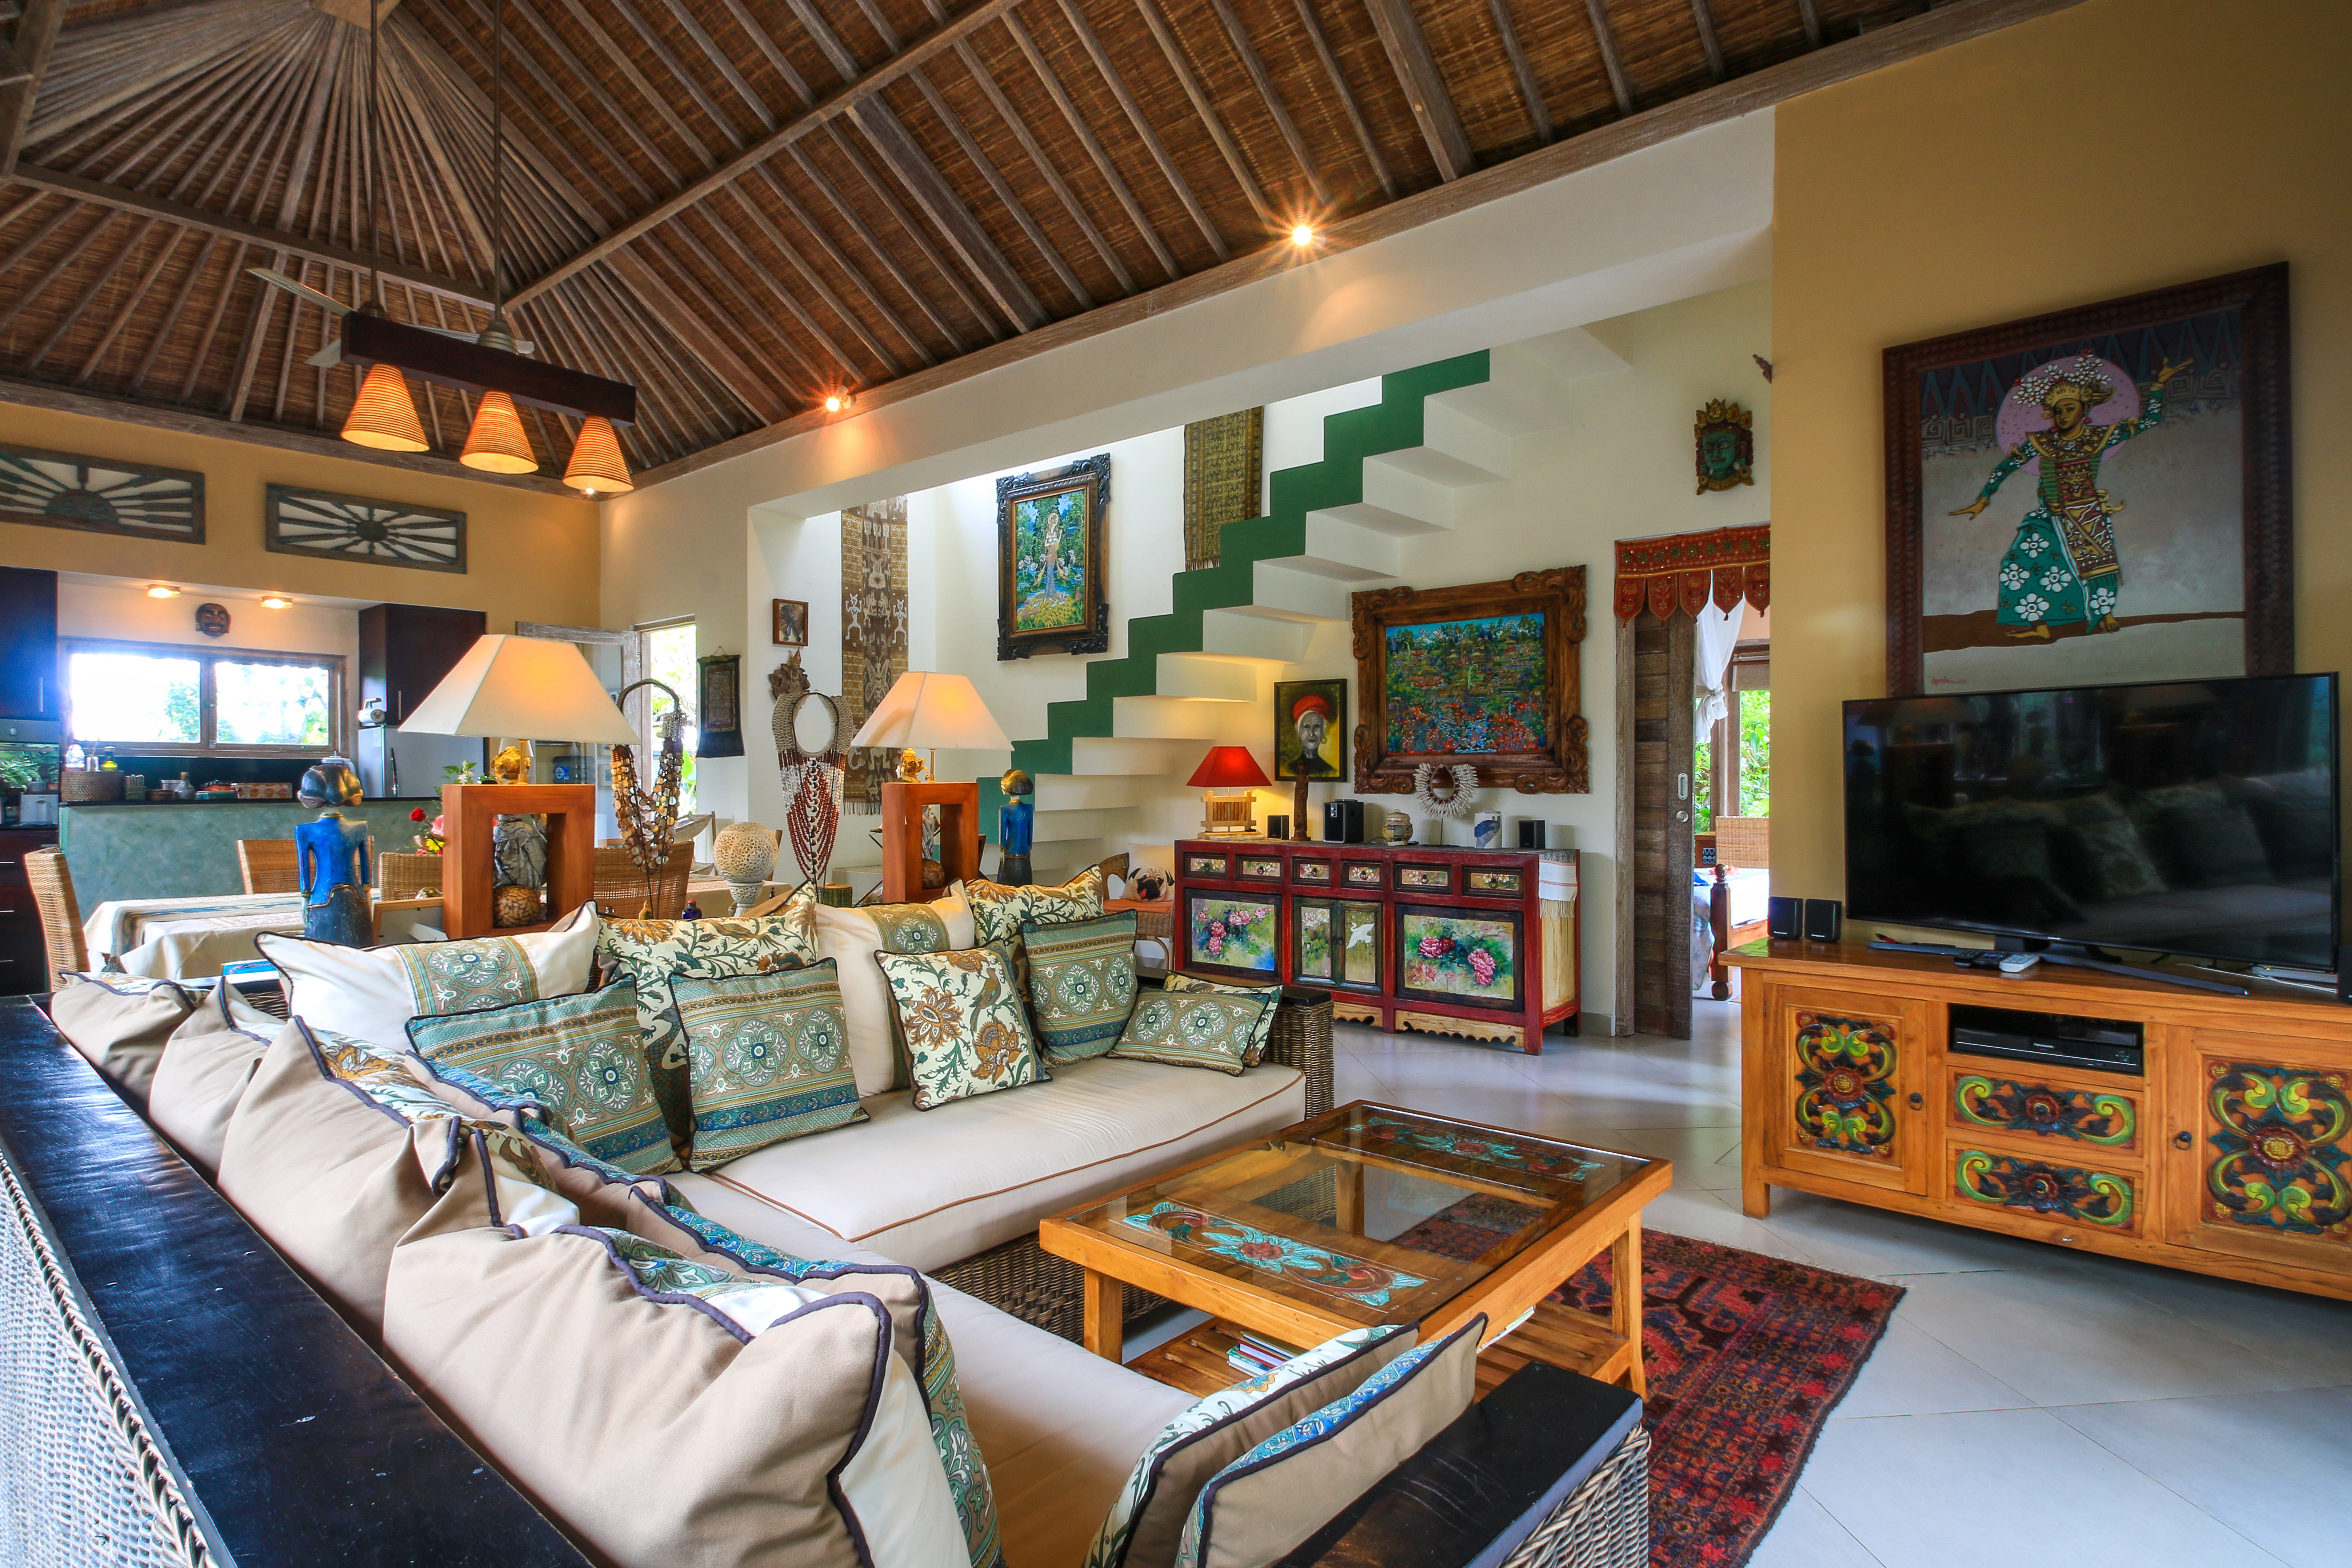 Vss Ubud Villa Pool ac bestes Fruhstuck in Bali Bungalow in Asien und Naher Osten